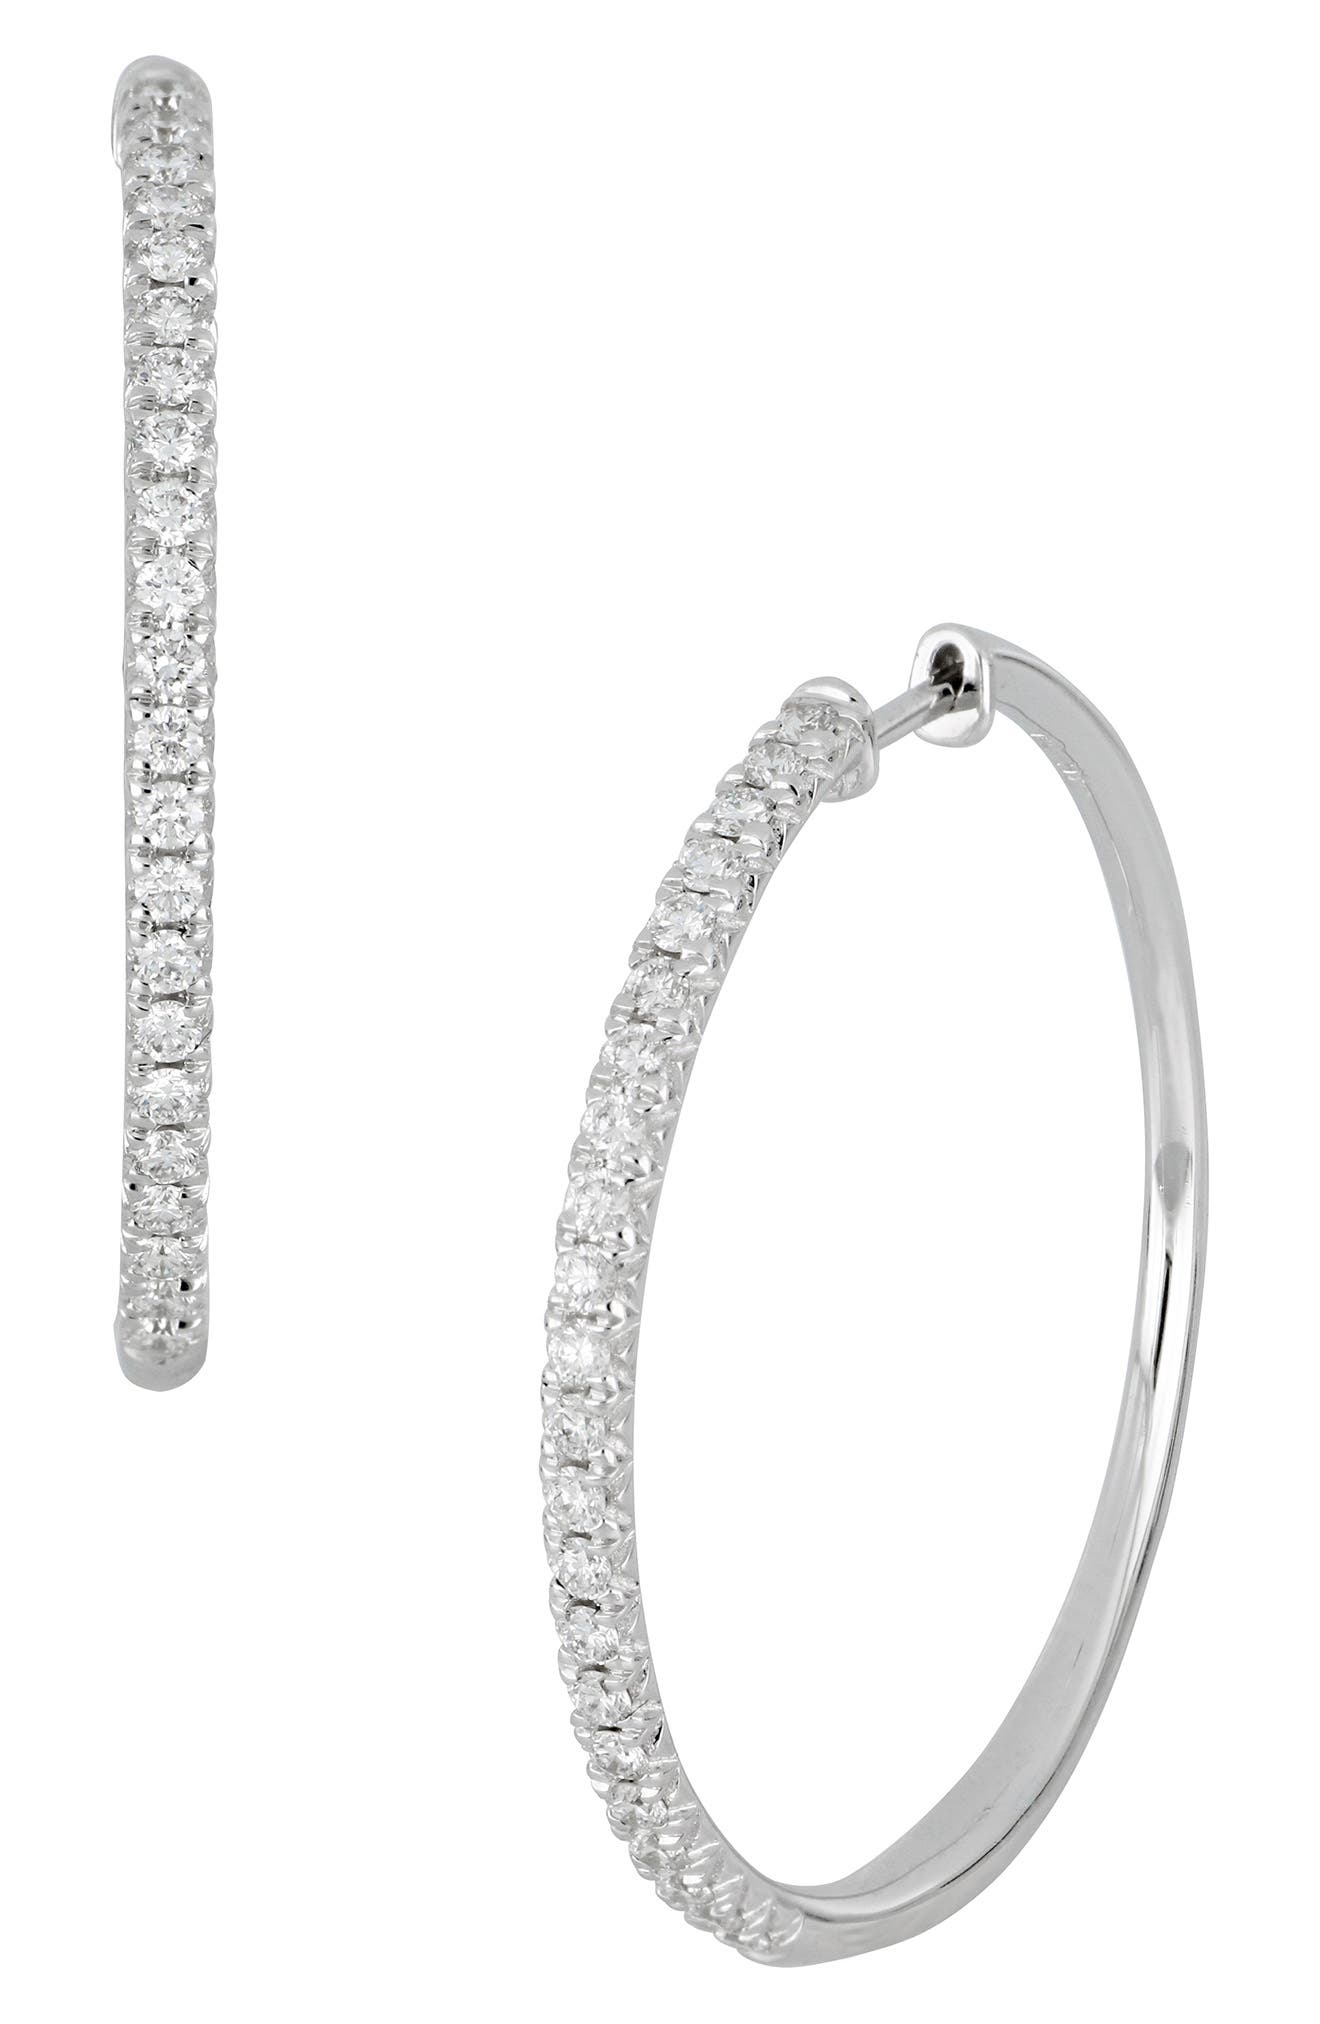 Kiera French Cut Diamond Hoop Earrings,                             Main thumbnail 1, color,                             D0.75 GVS 18KWG